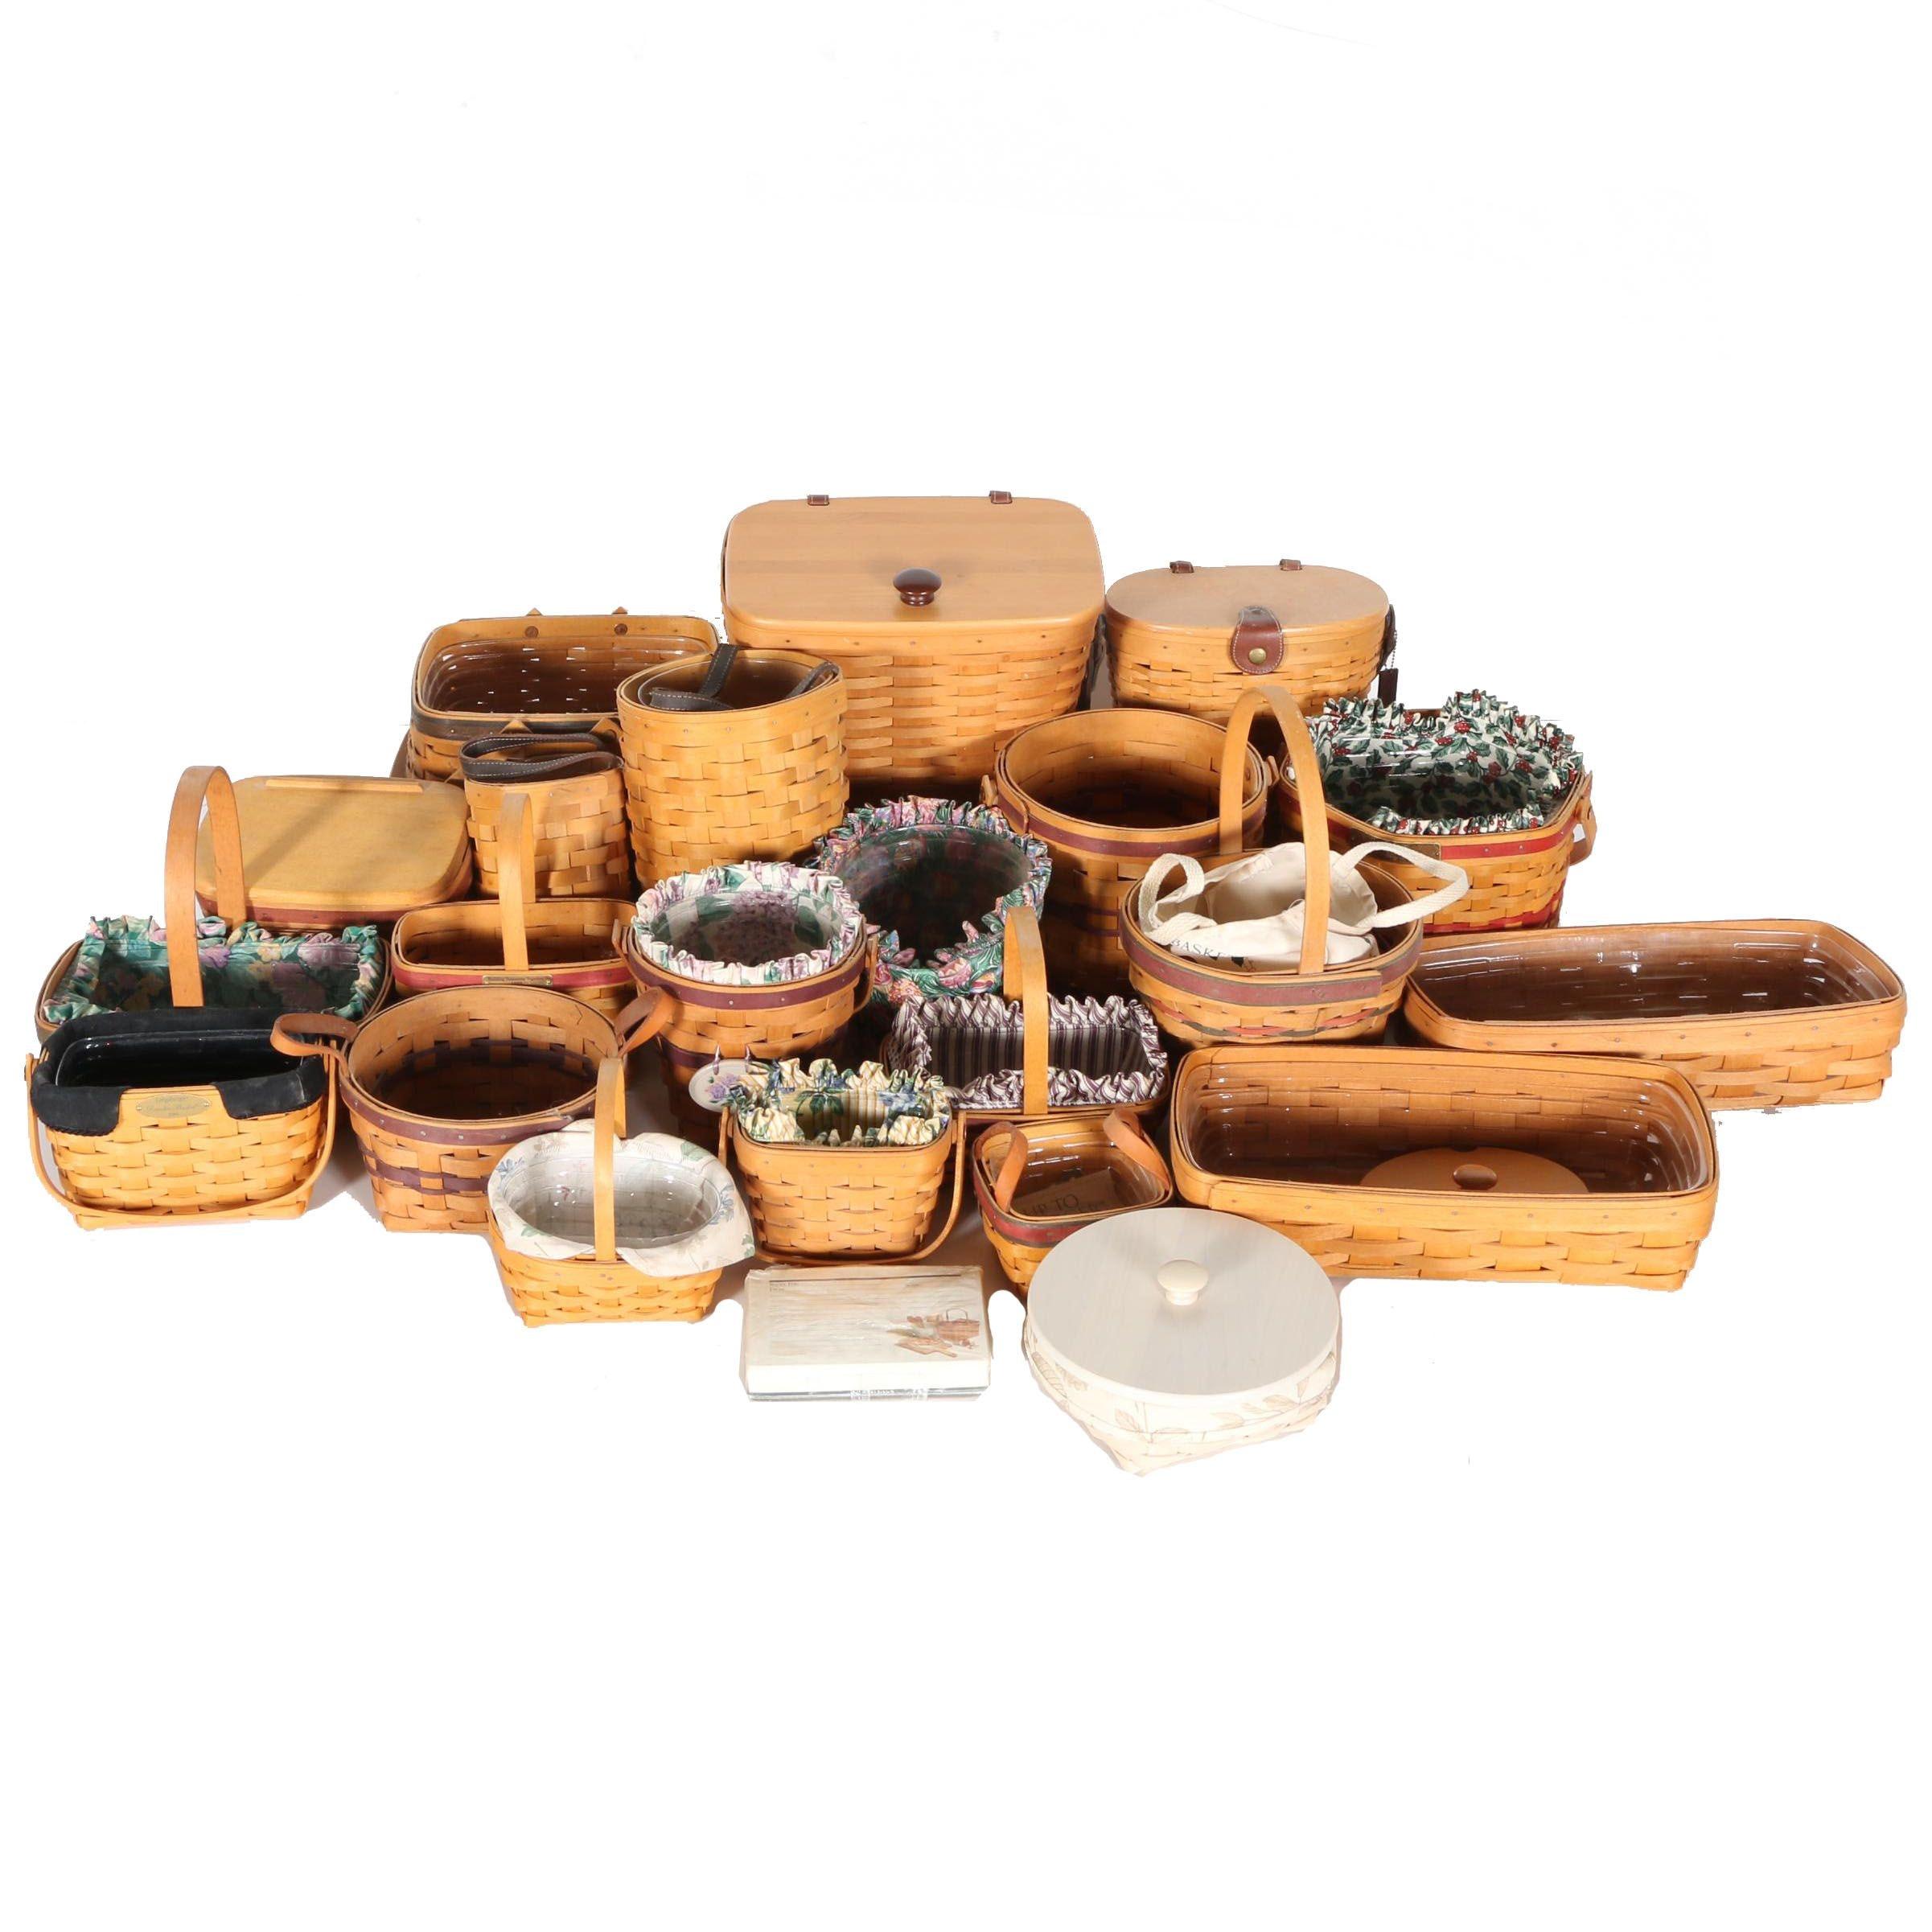 Large Assortment of Longaberger Baskets